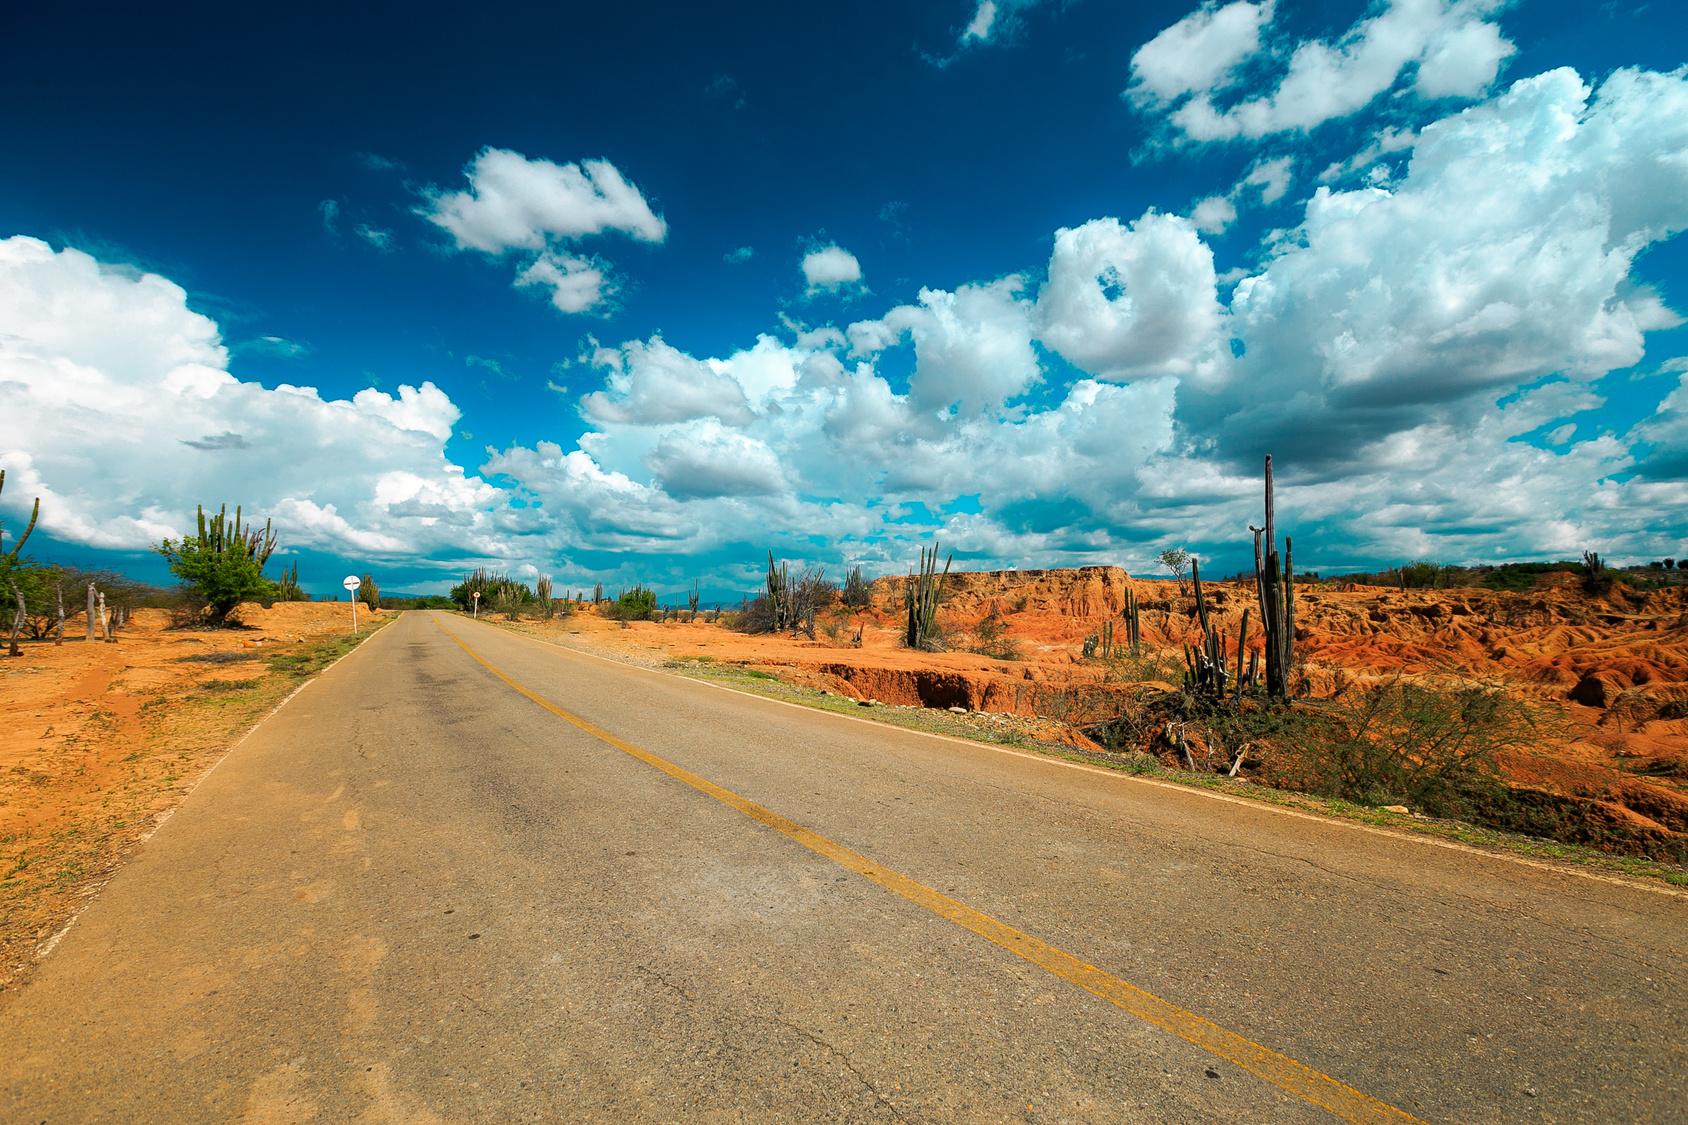 desert road, colombia, latin america, empty road in desert